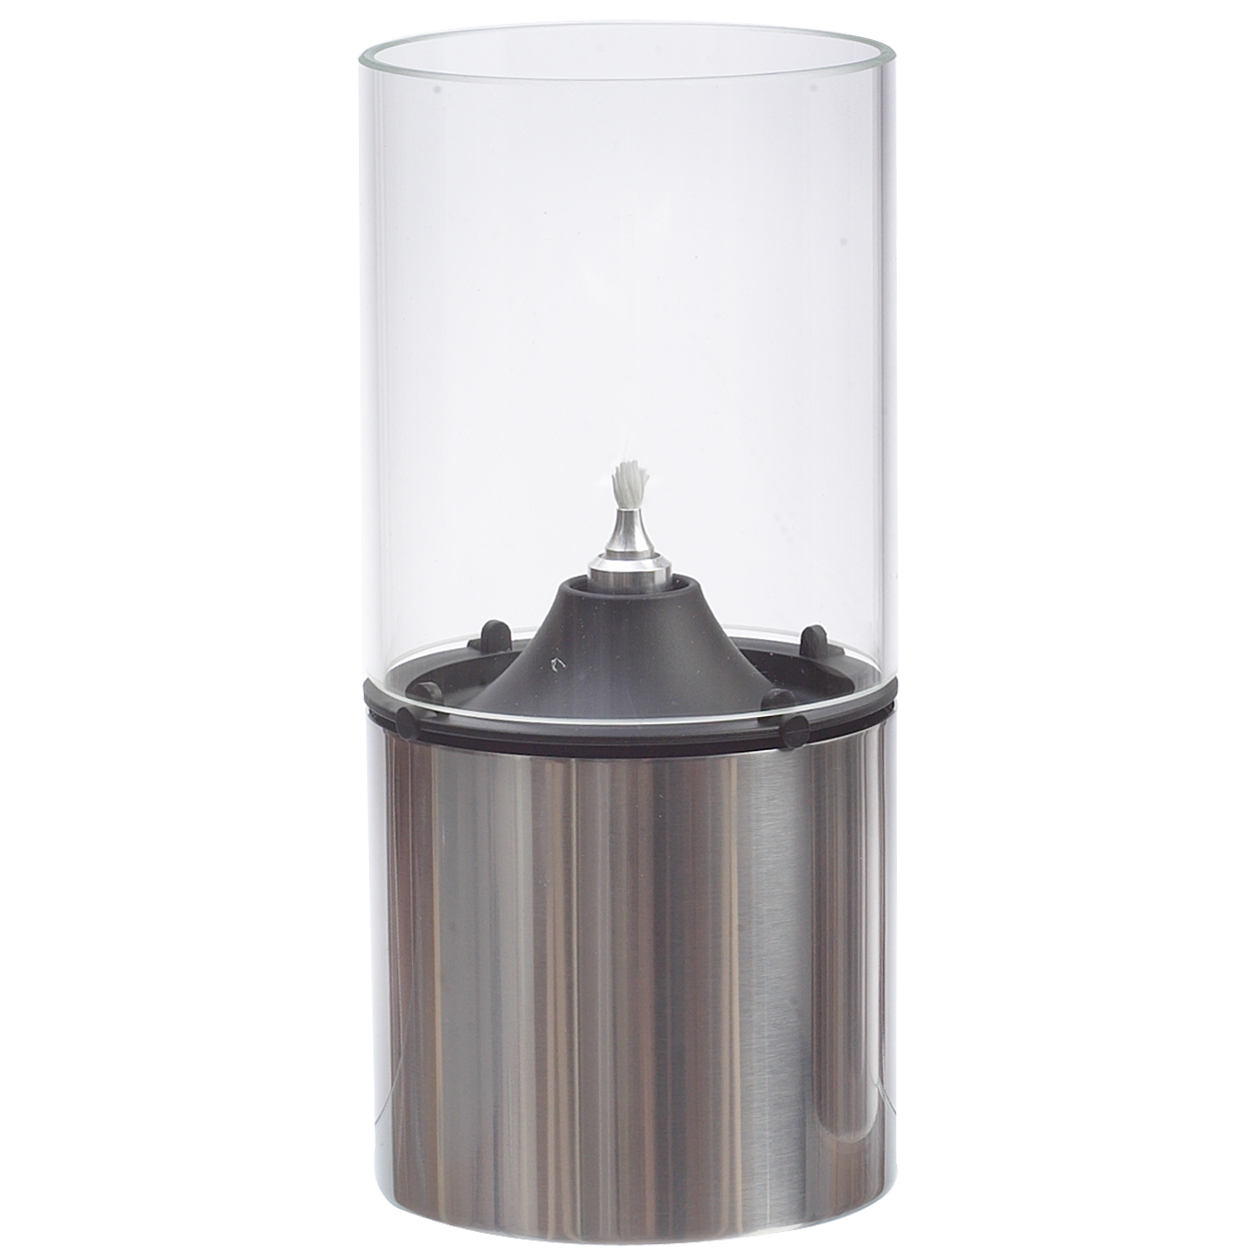 Oljelampa 18 cm Klarglas